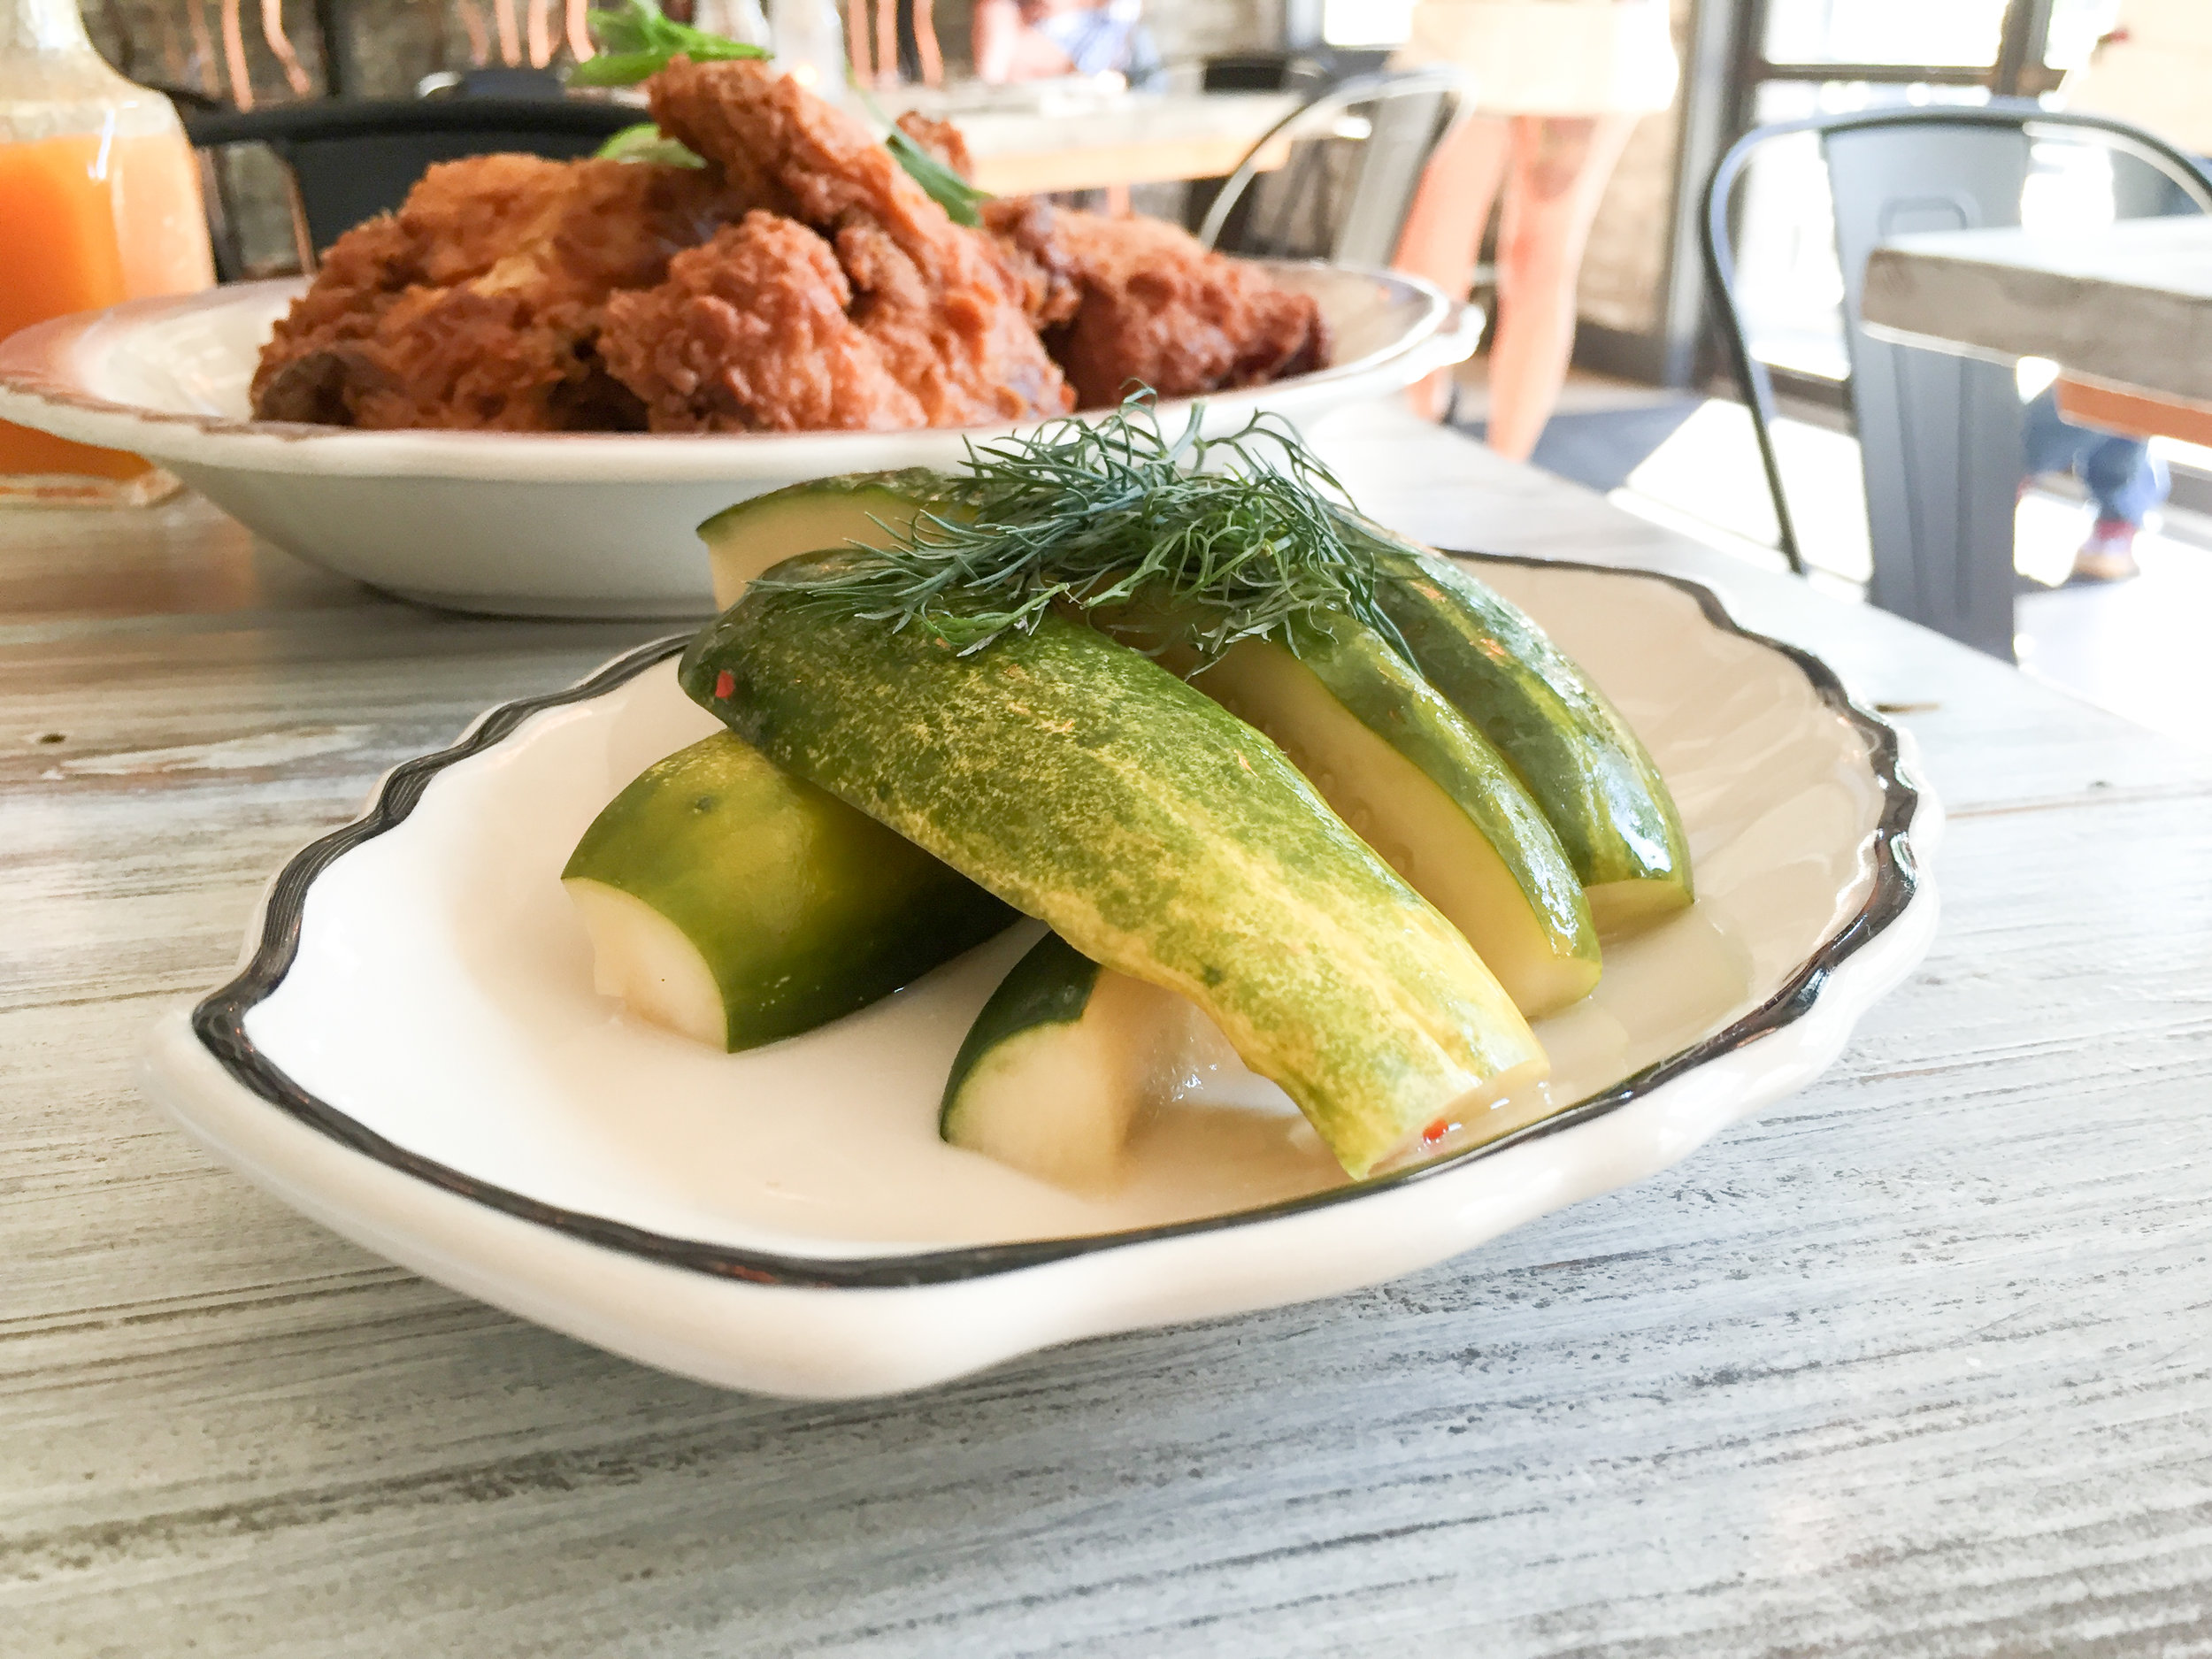 haberdish-noda-charlotte-nc-daily-pickle